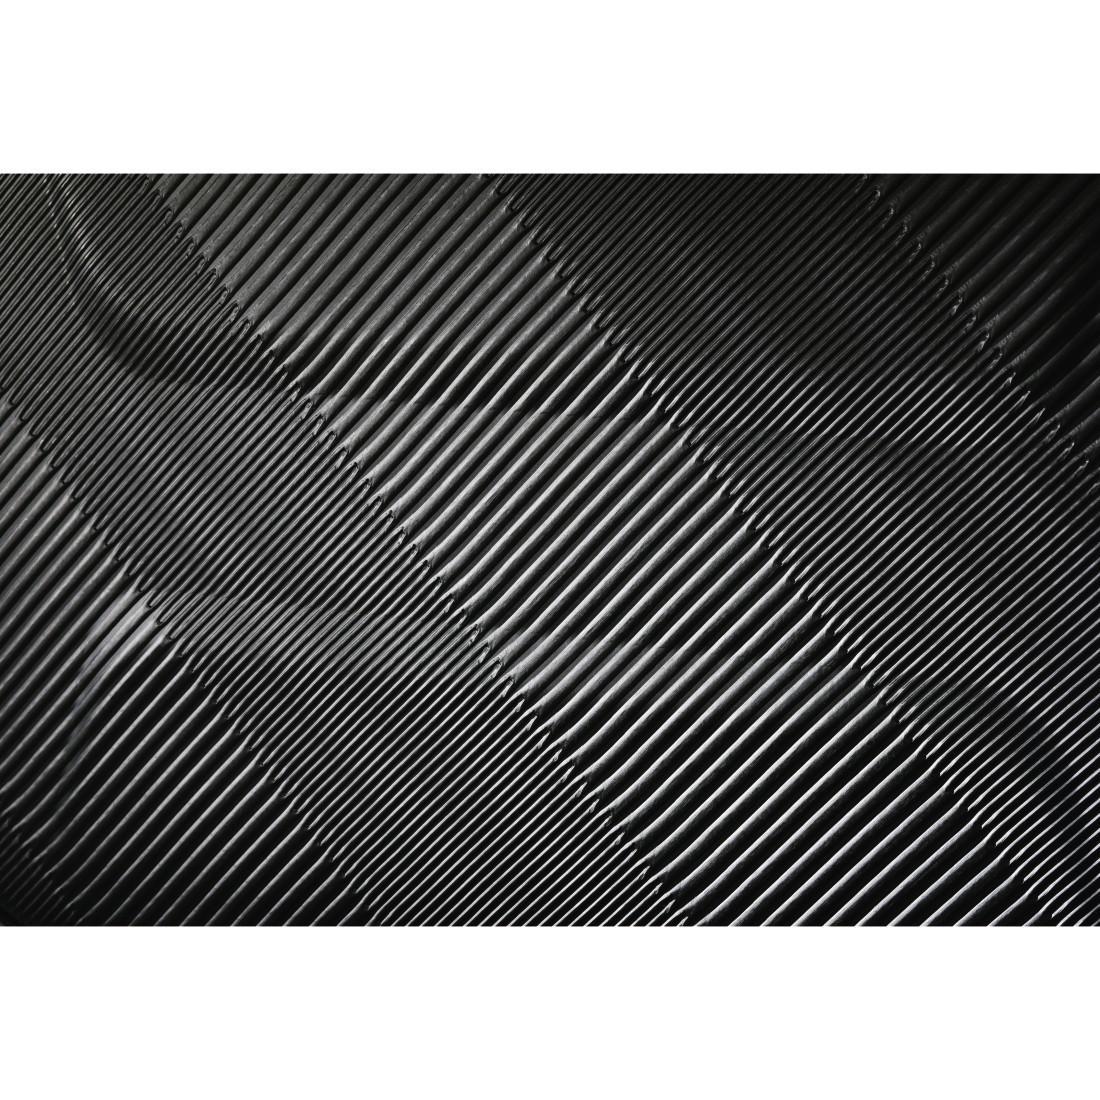 Универсален калъф за лаптоп HAMA Protection, до 34 см  (13.3),  удароустойчив, пластмасов, Черен-3